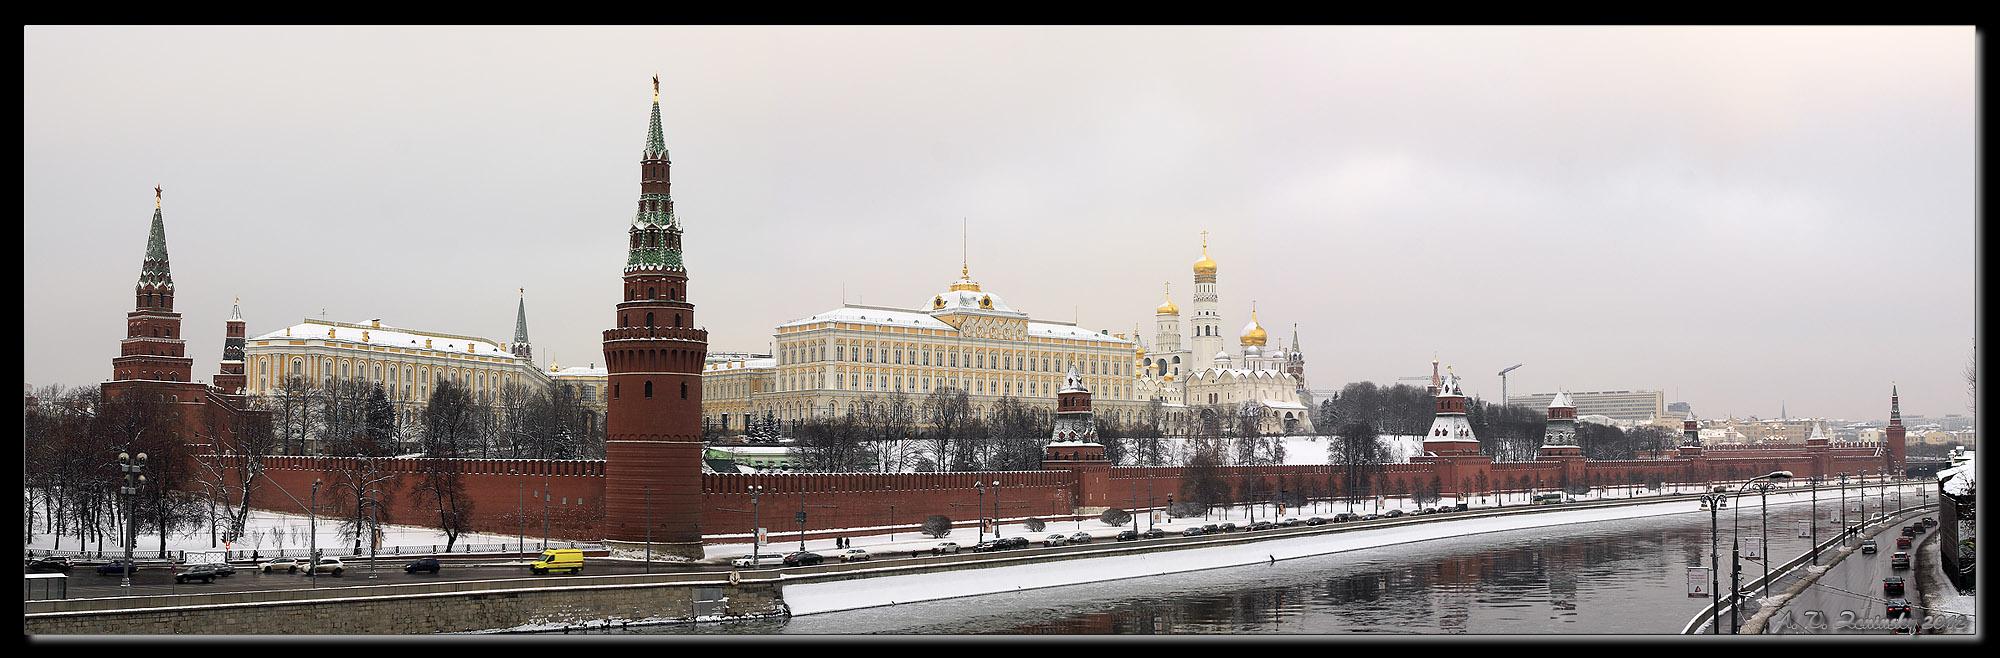 "фото ""Панорама московского Кремля."" метки: архитектура, пейзаж, панорама, Европа, башня, вода, дорога, здание, зима, облака, храм"